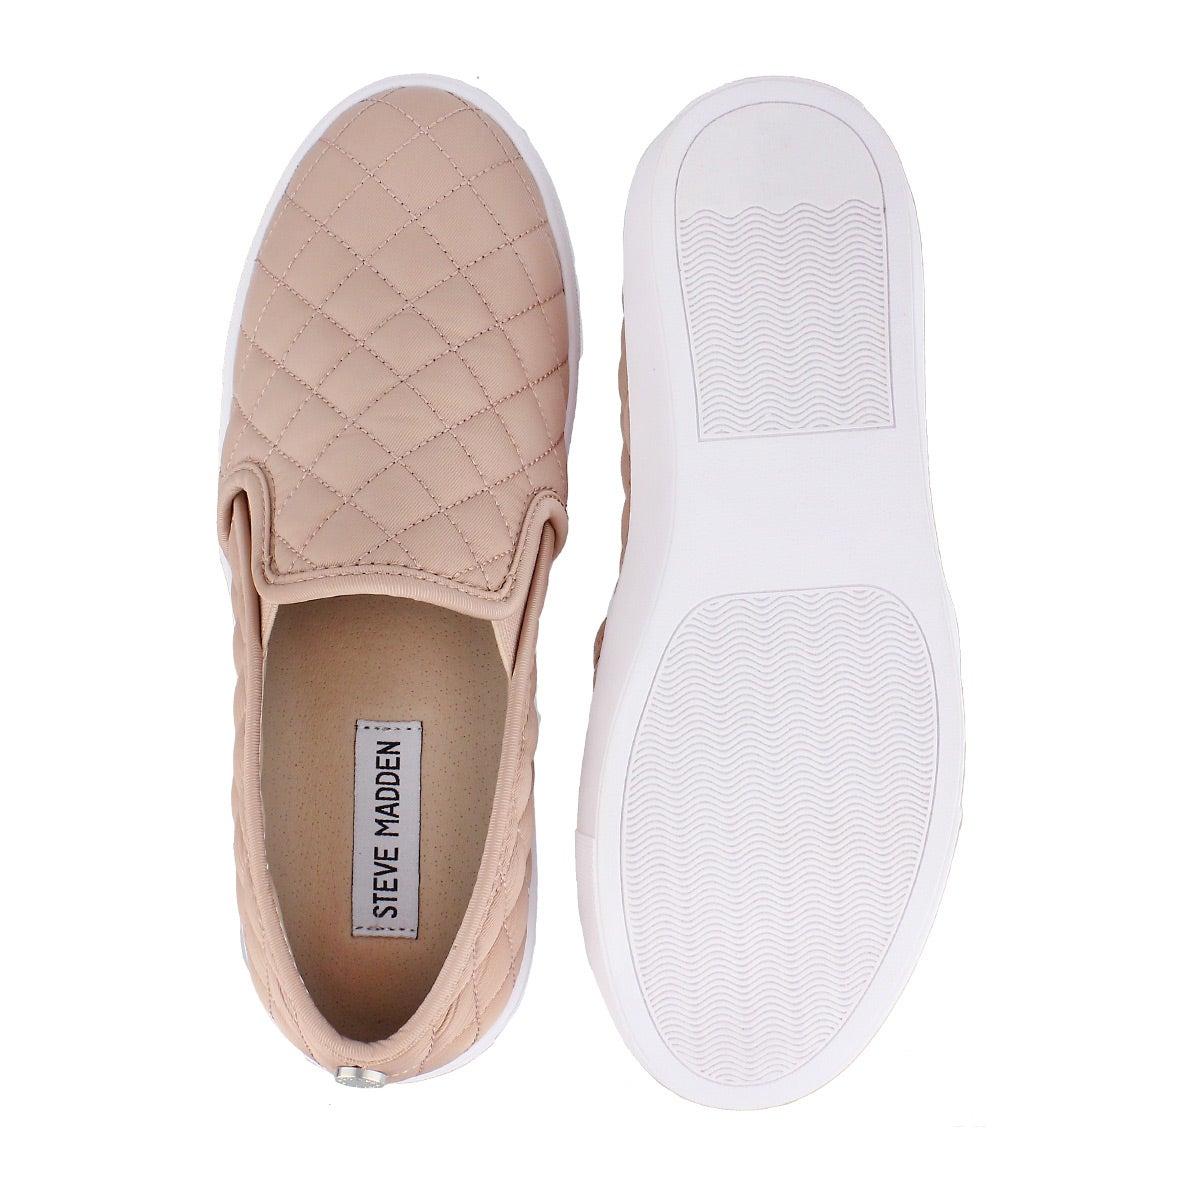 Lds Ecentrcq pink casual slip on shoe